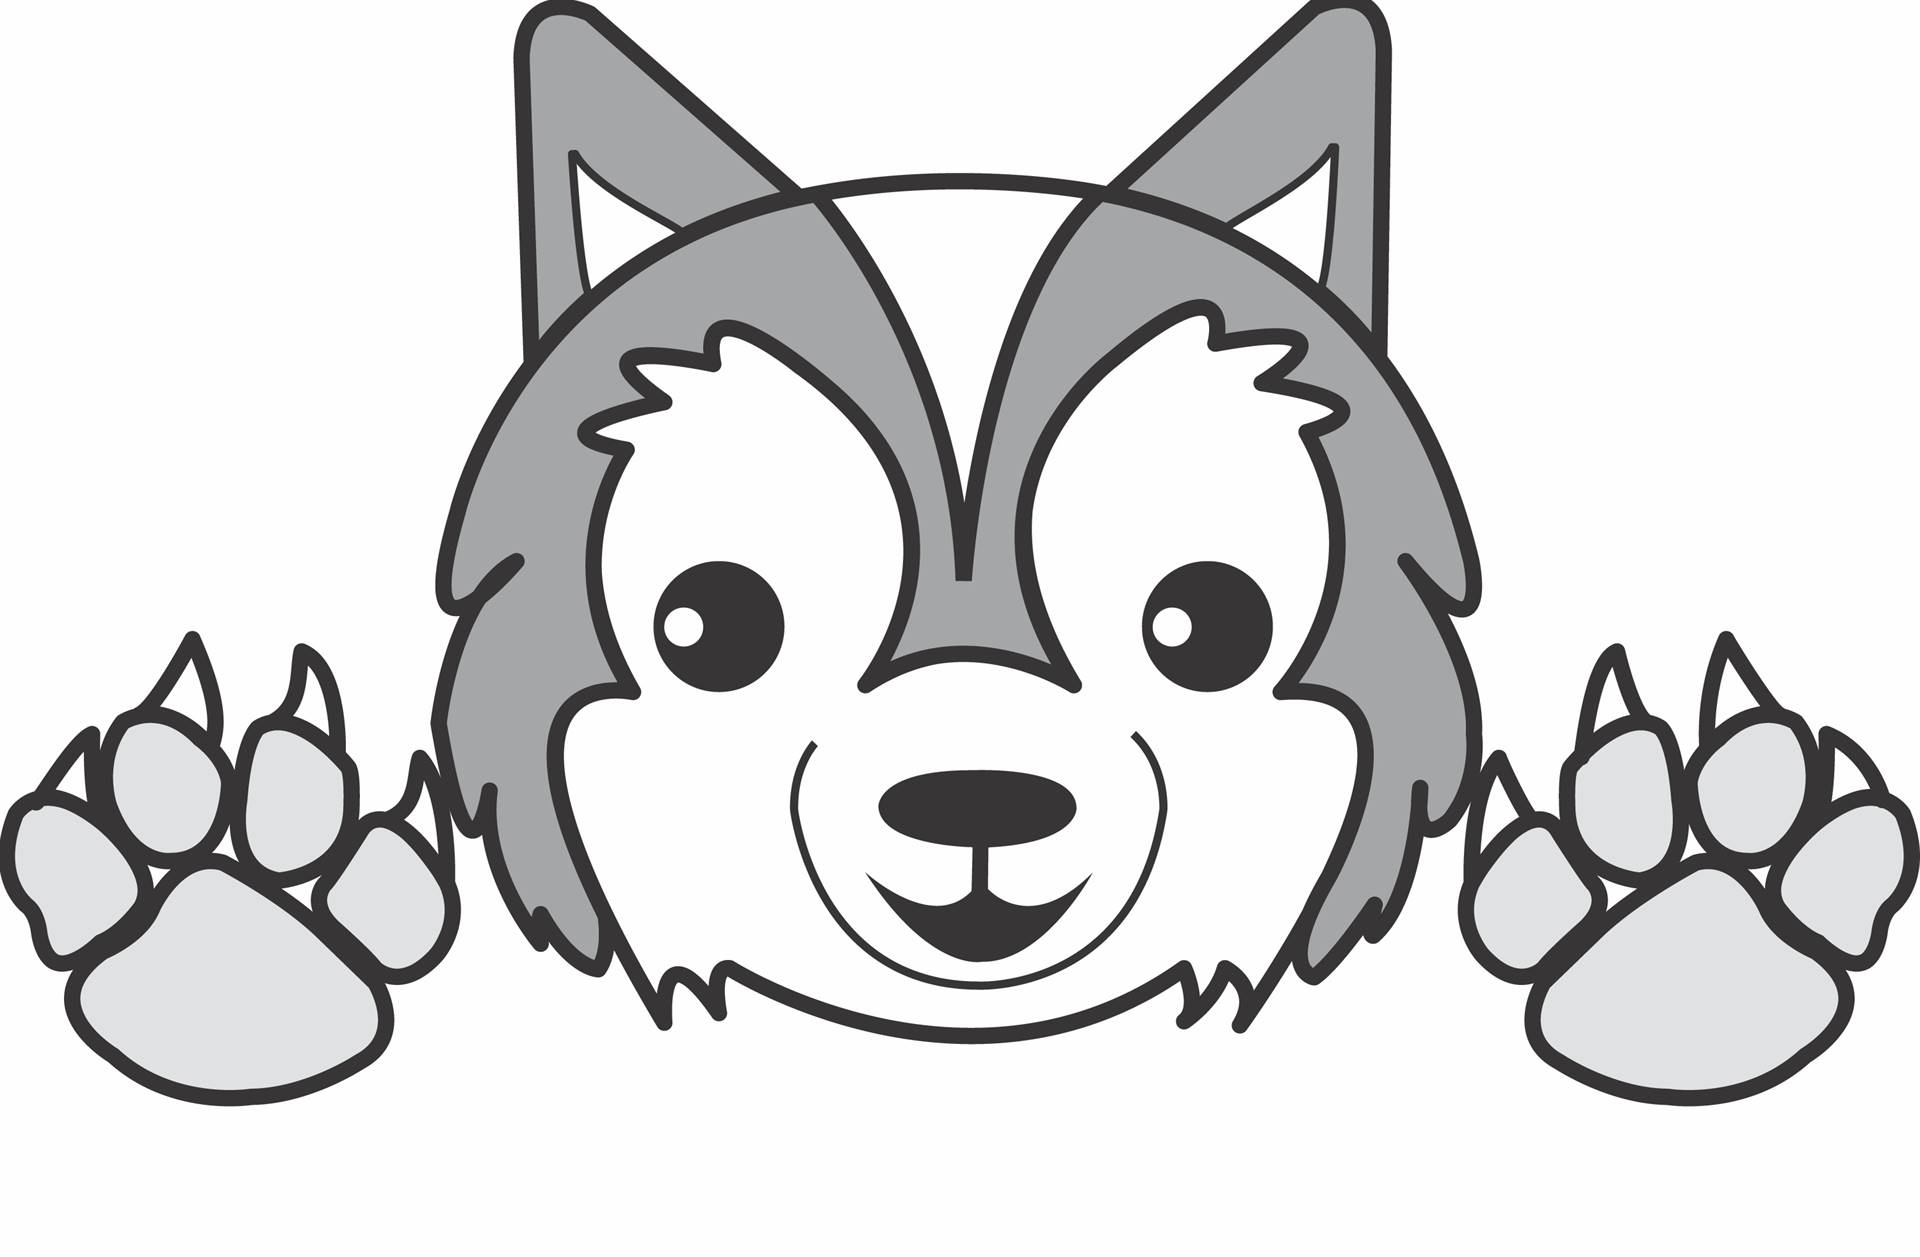 Elementary School Mascot - wolf